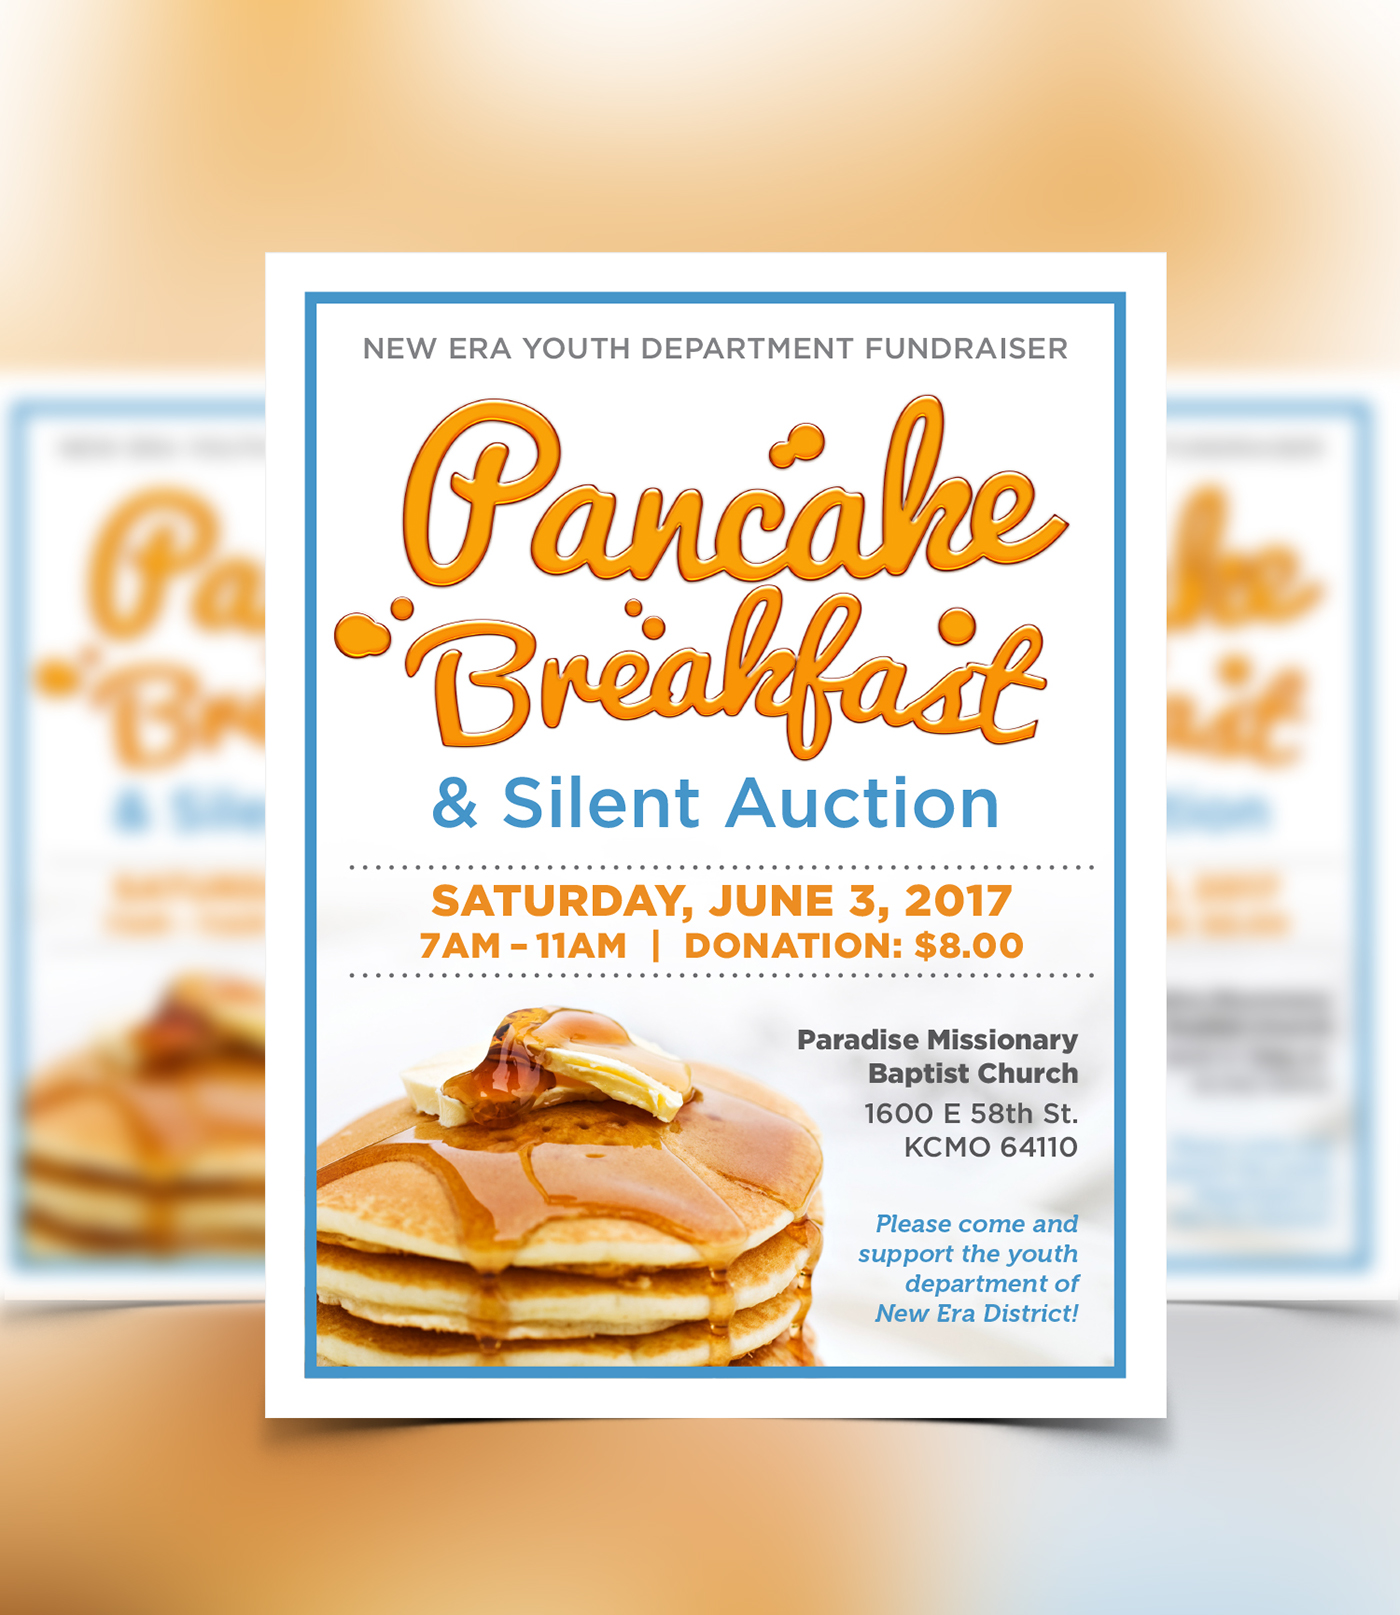 new era youth dept pancake breakfast fundraiser on behance. Black Bedroom Furniture Sets. Home Design Ideas